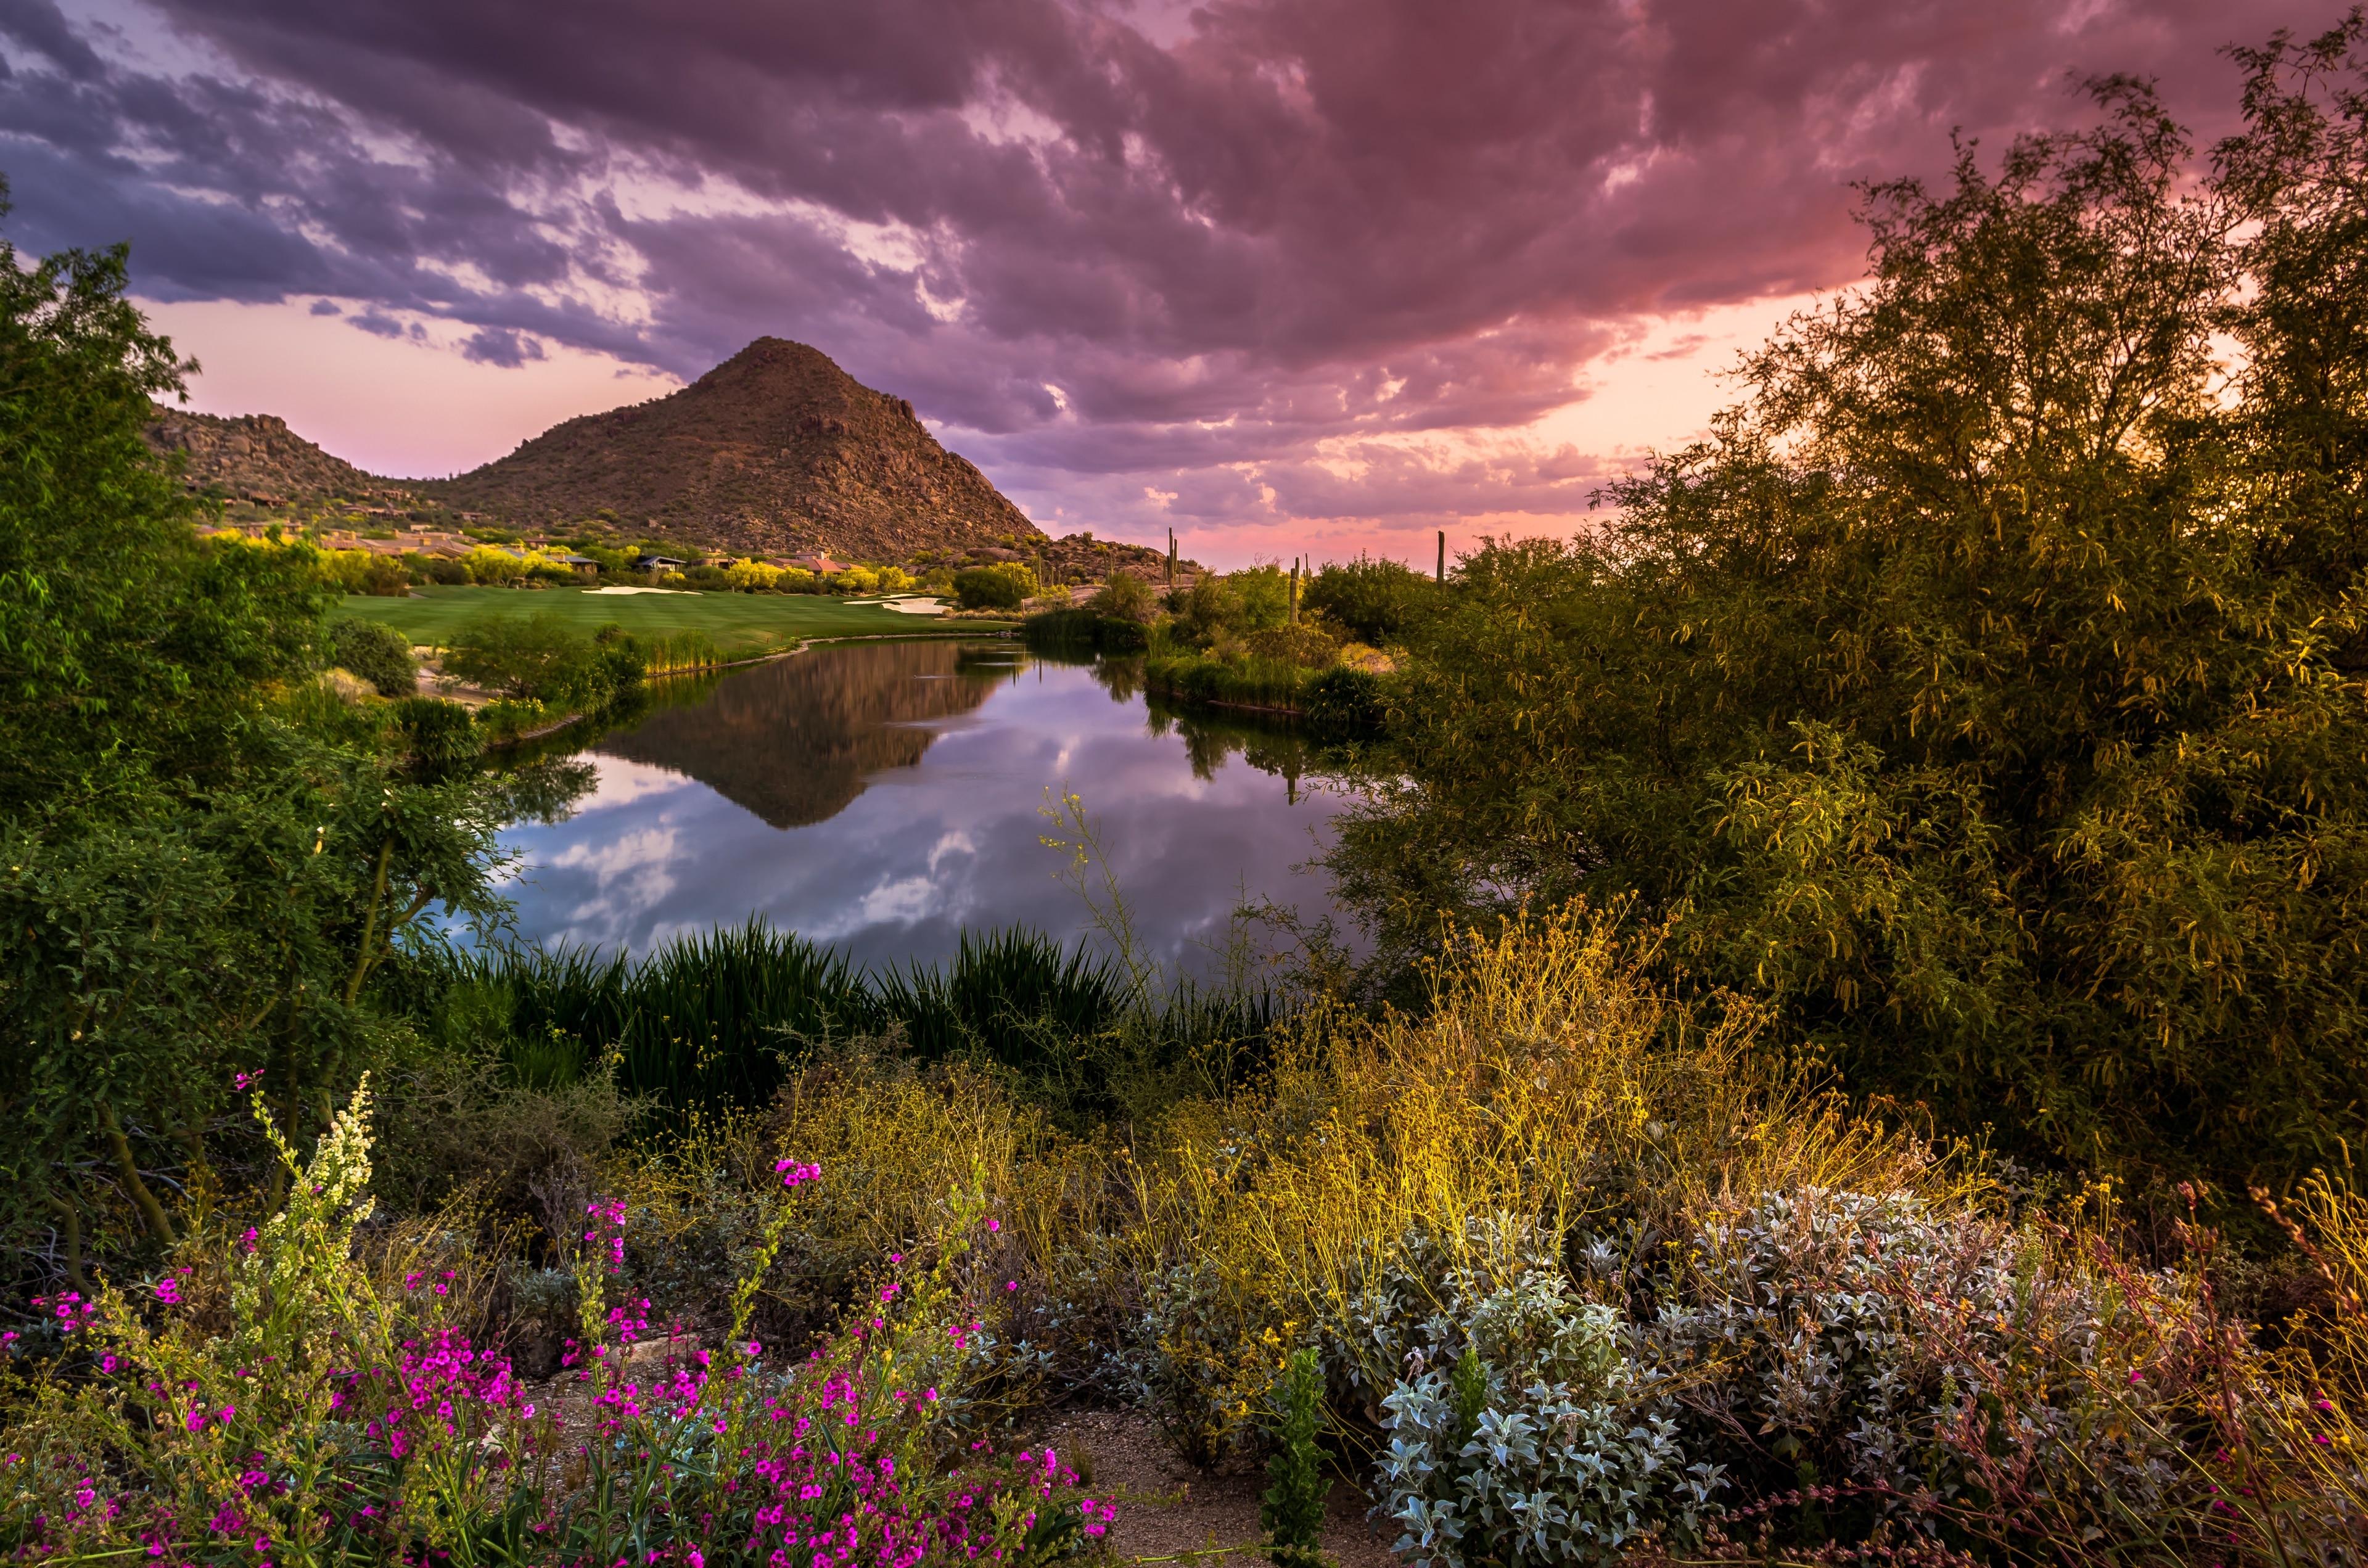 Maricopa, Arizona, United States of America